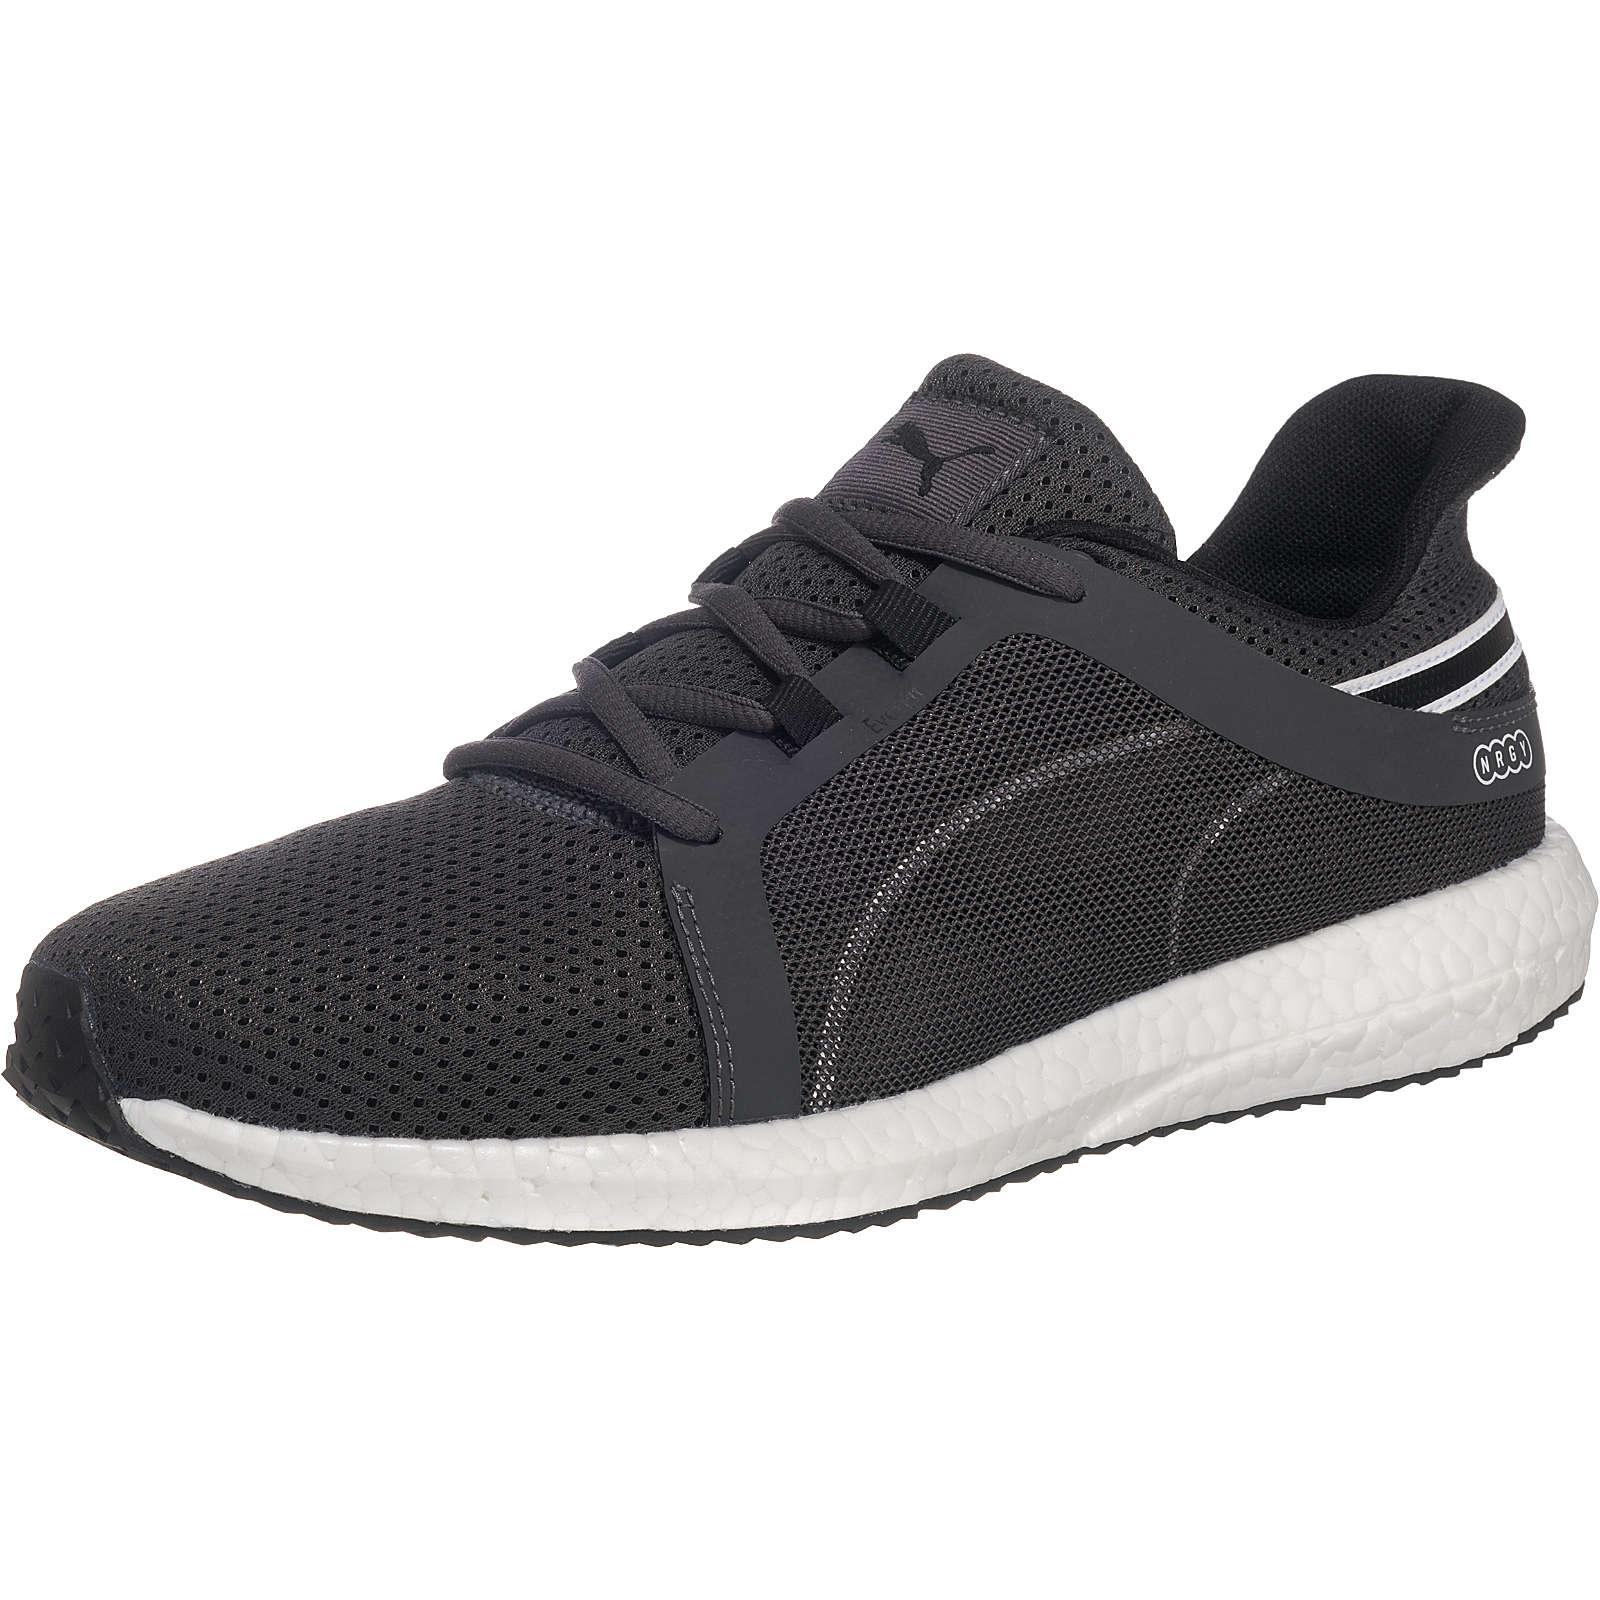 PUMA Mega Nrgy Turbo 2 Sneakers Low schwarz Herren Gr. 42